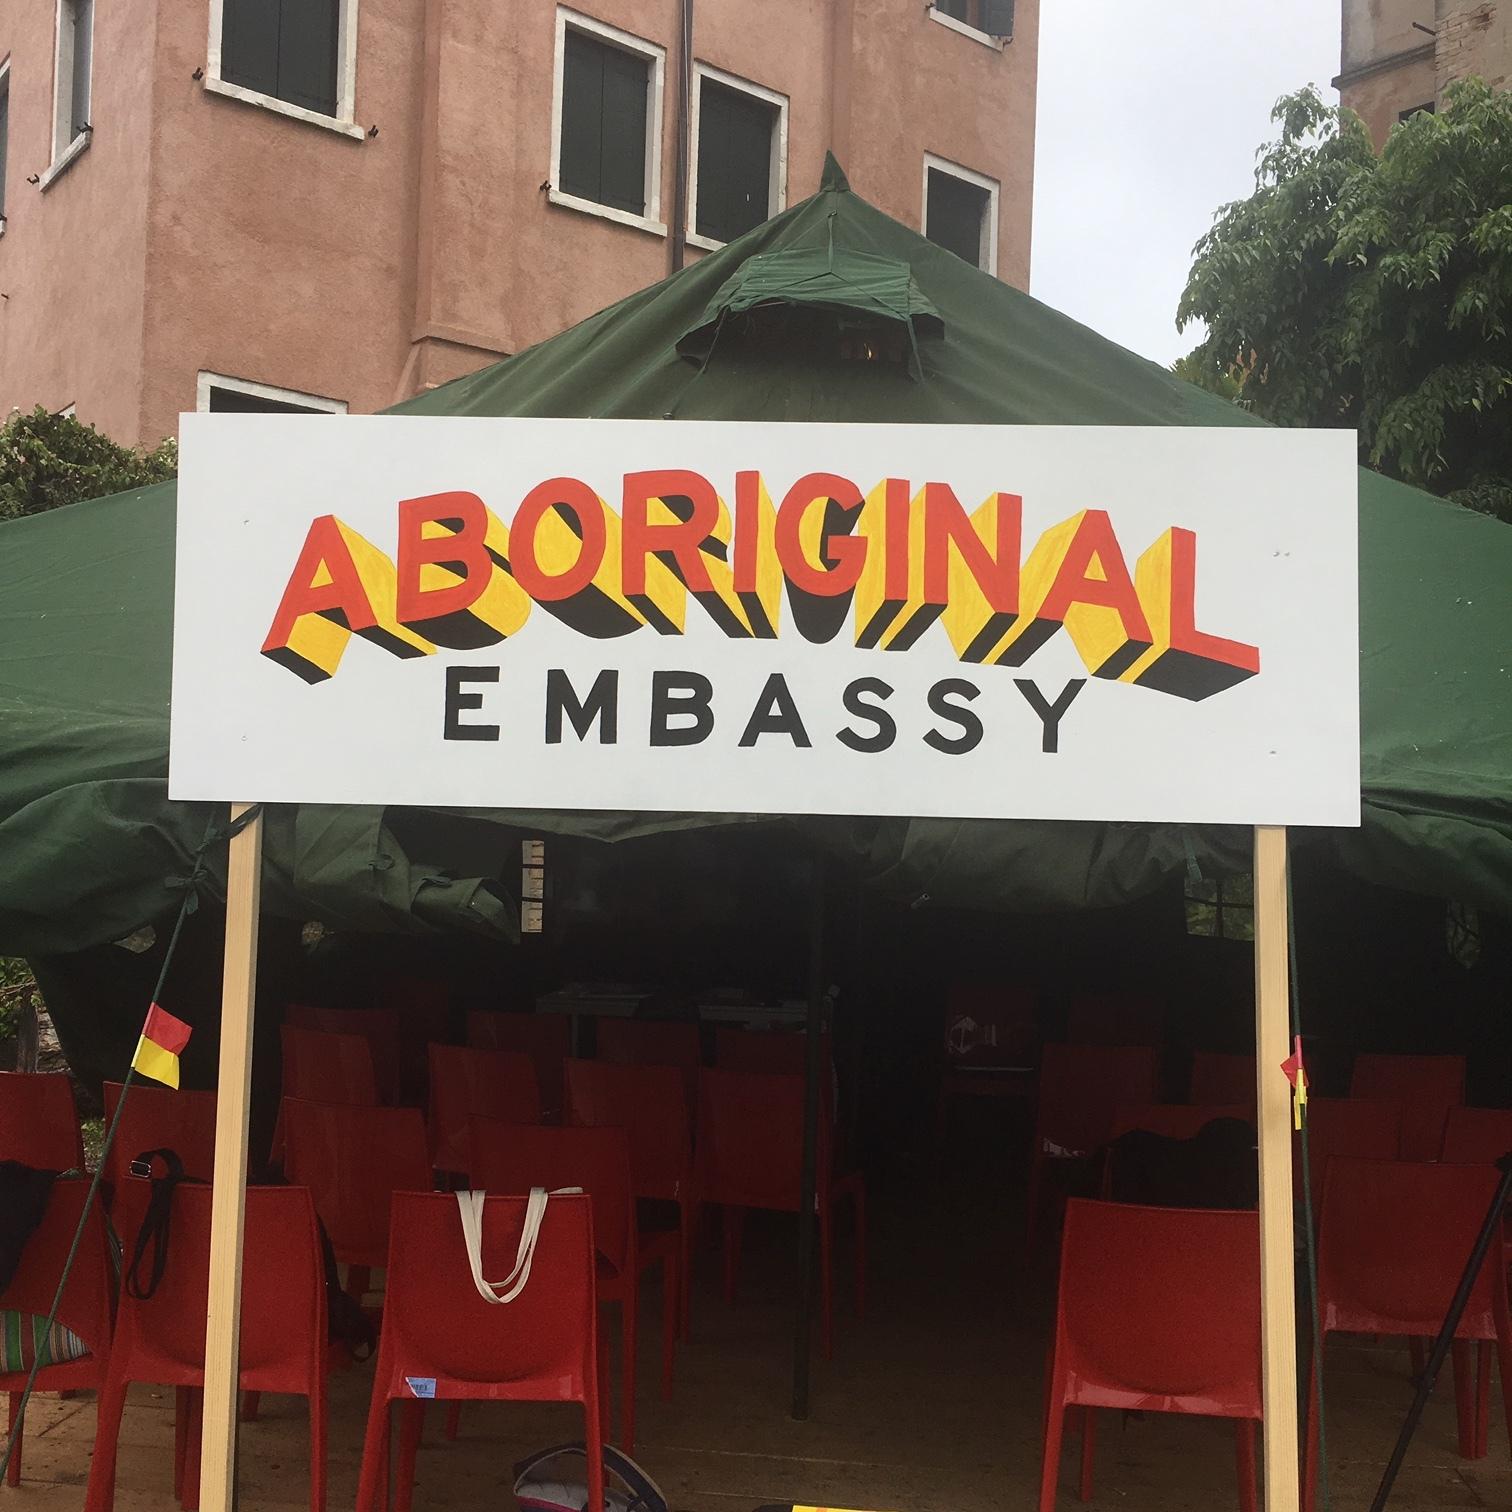 Aboriginal Embassy 1.JPG